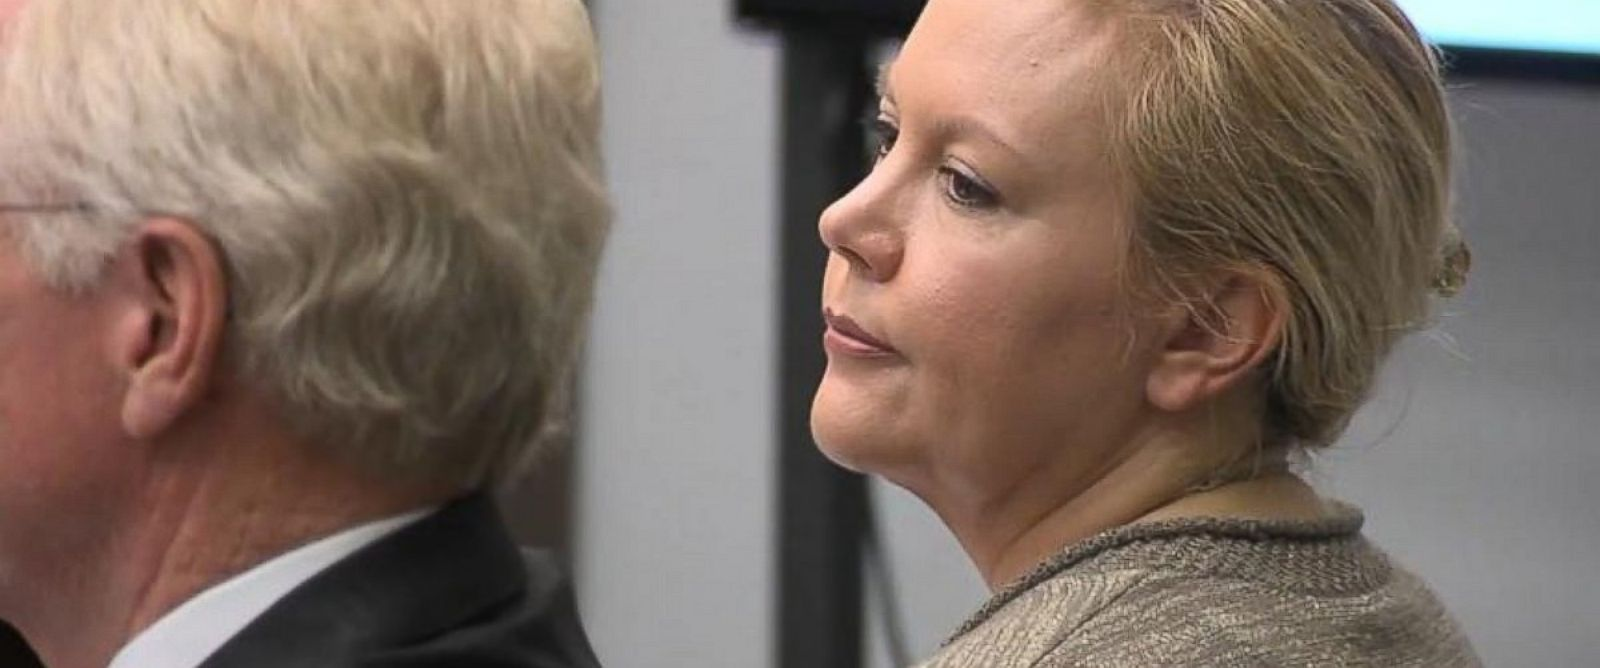 PHOTO: Julie Harper, 41, faced trial in the 2012 shooting death of her husband, Jason Harper.